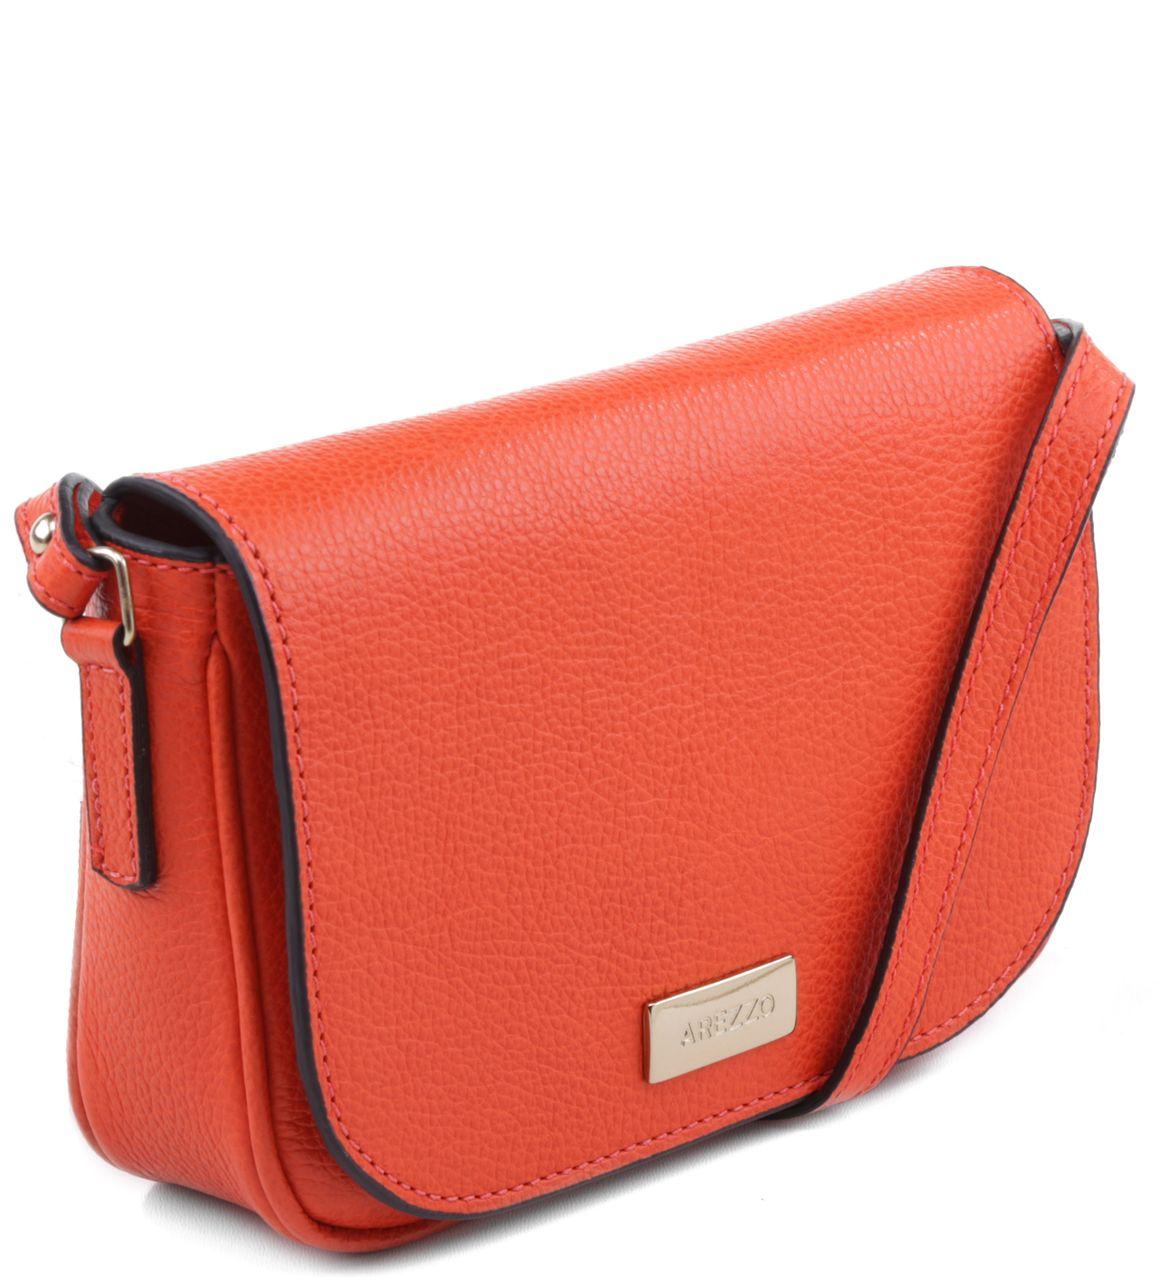 Bolsa Tiracolo Couro Mandarin   Arezzo   Bags   Bags, Purses, Leather 0b88794e49